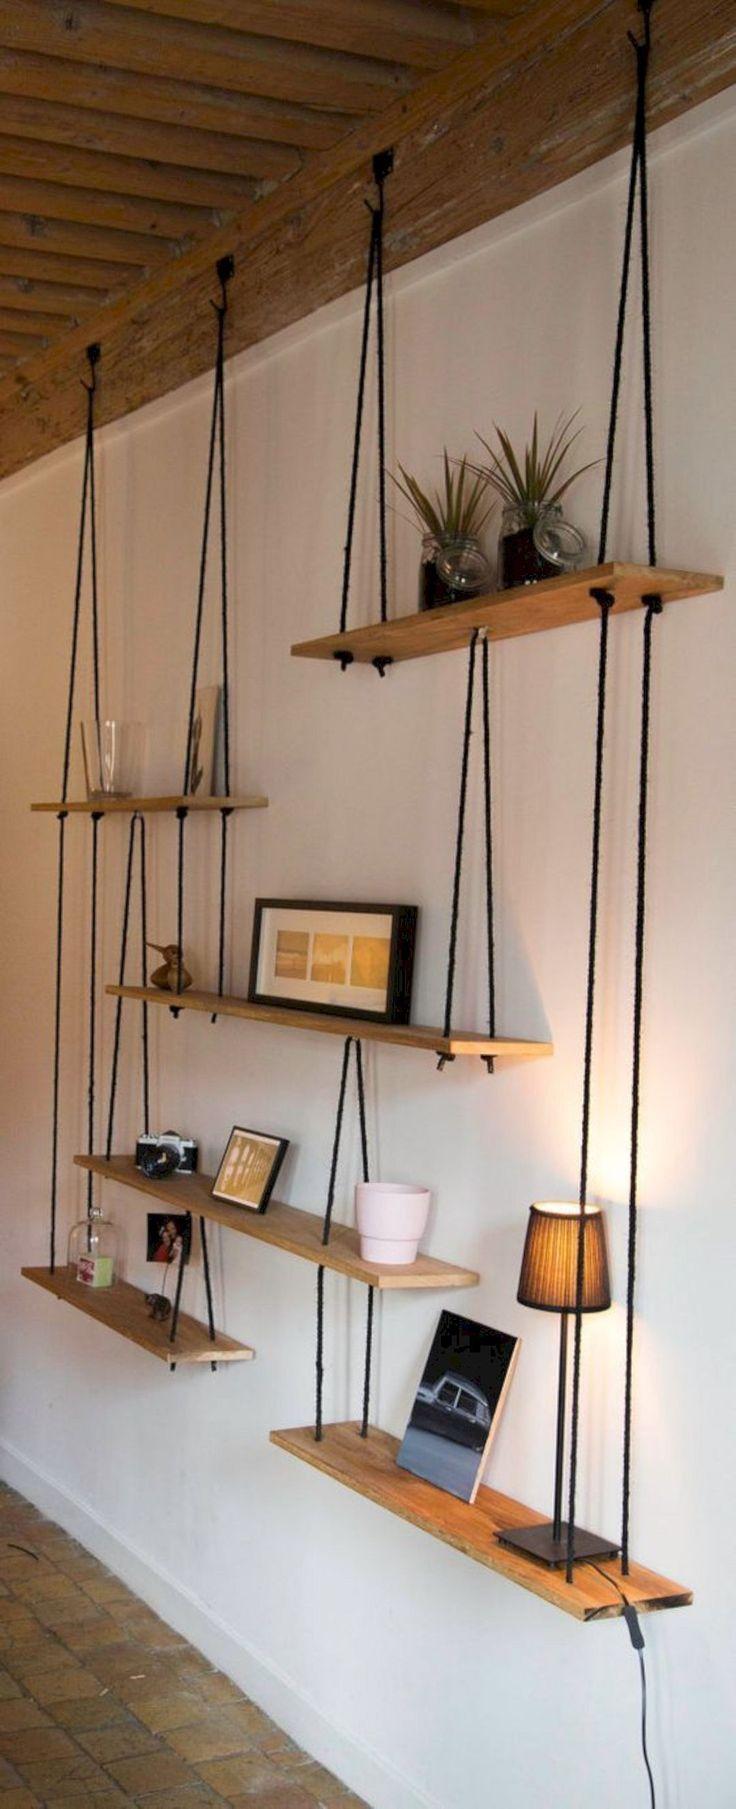 book/tchotchke shelves